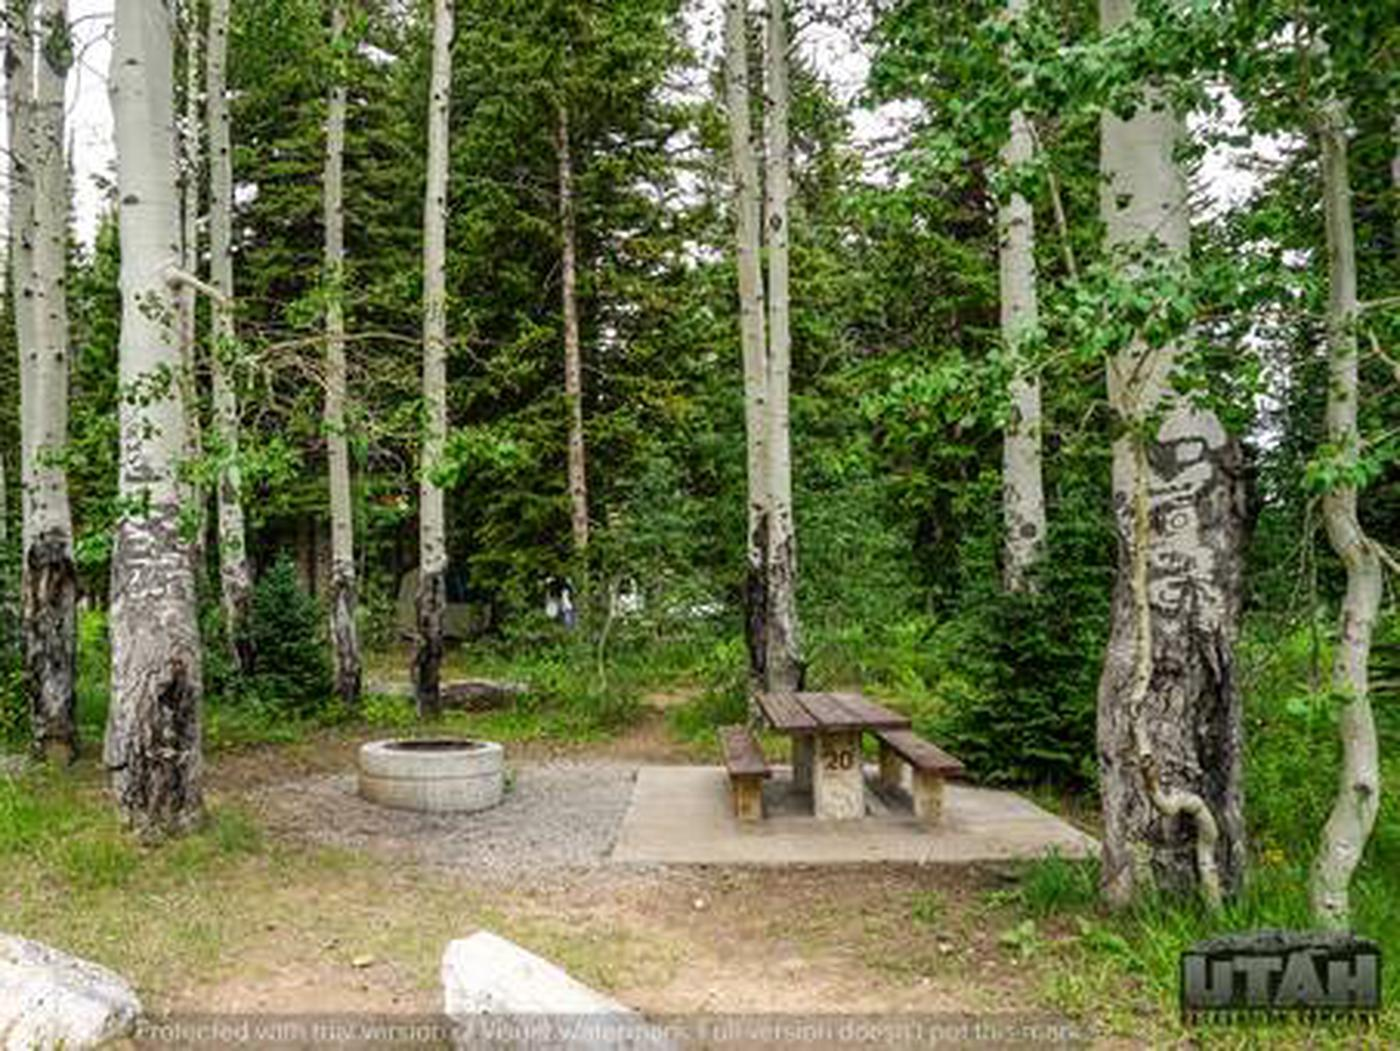 Monte Cristo Campground - MONT - 20